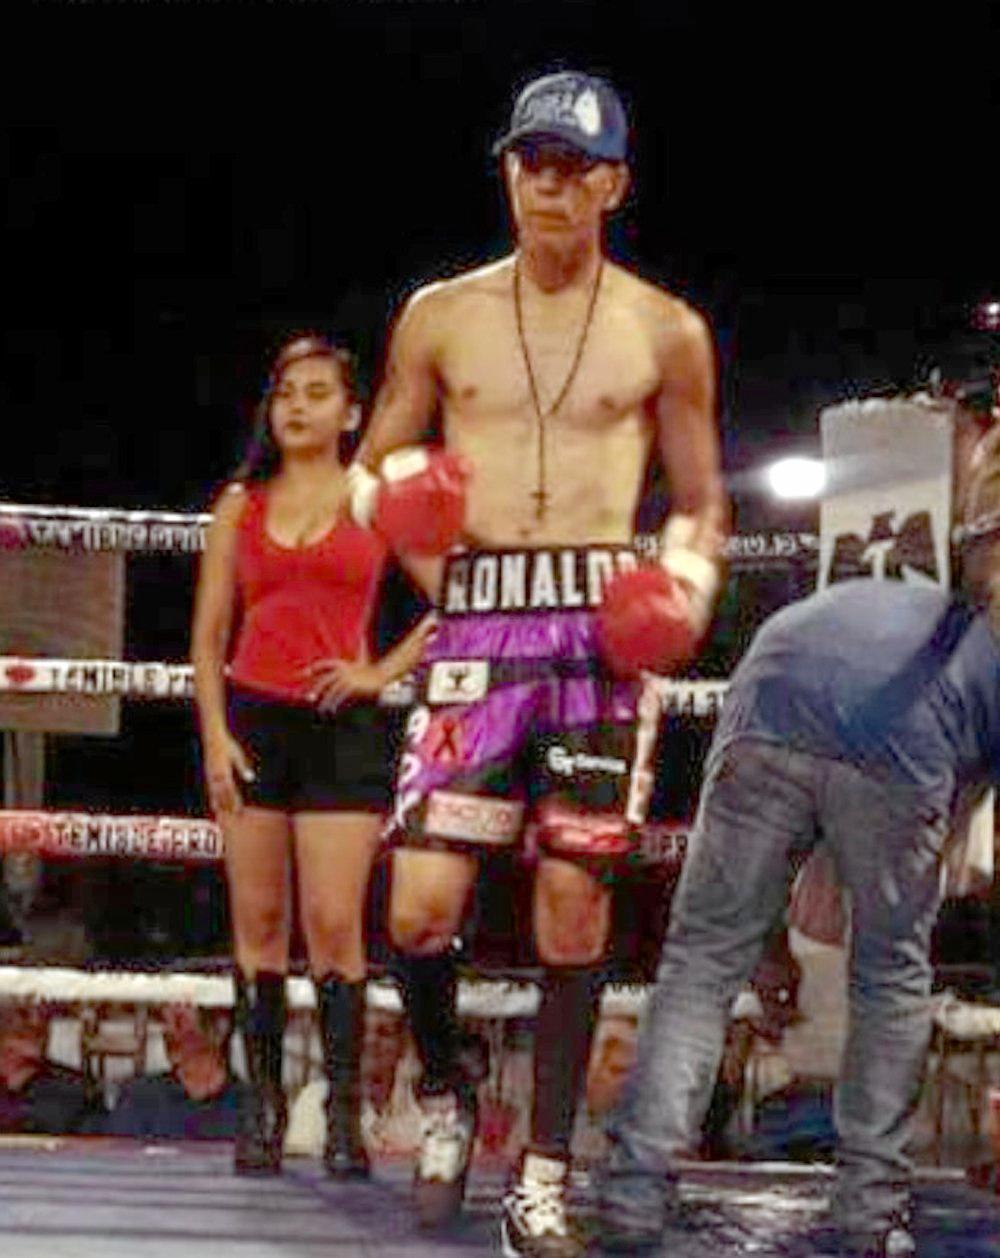 Mexican boxer, Ronaldo Loco Castillo